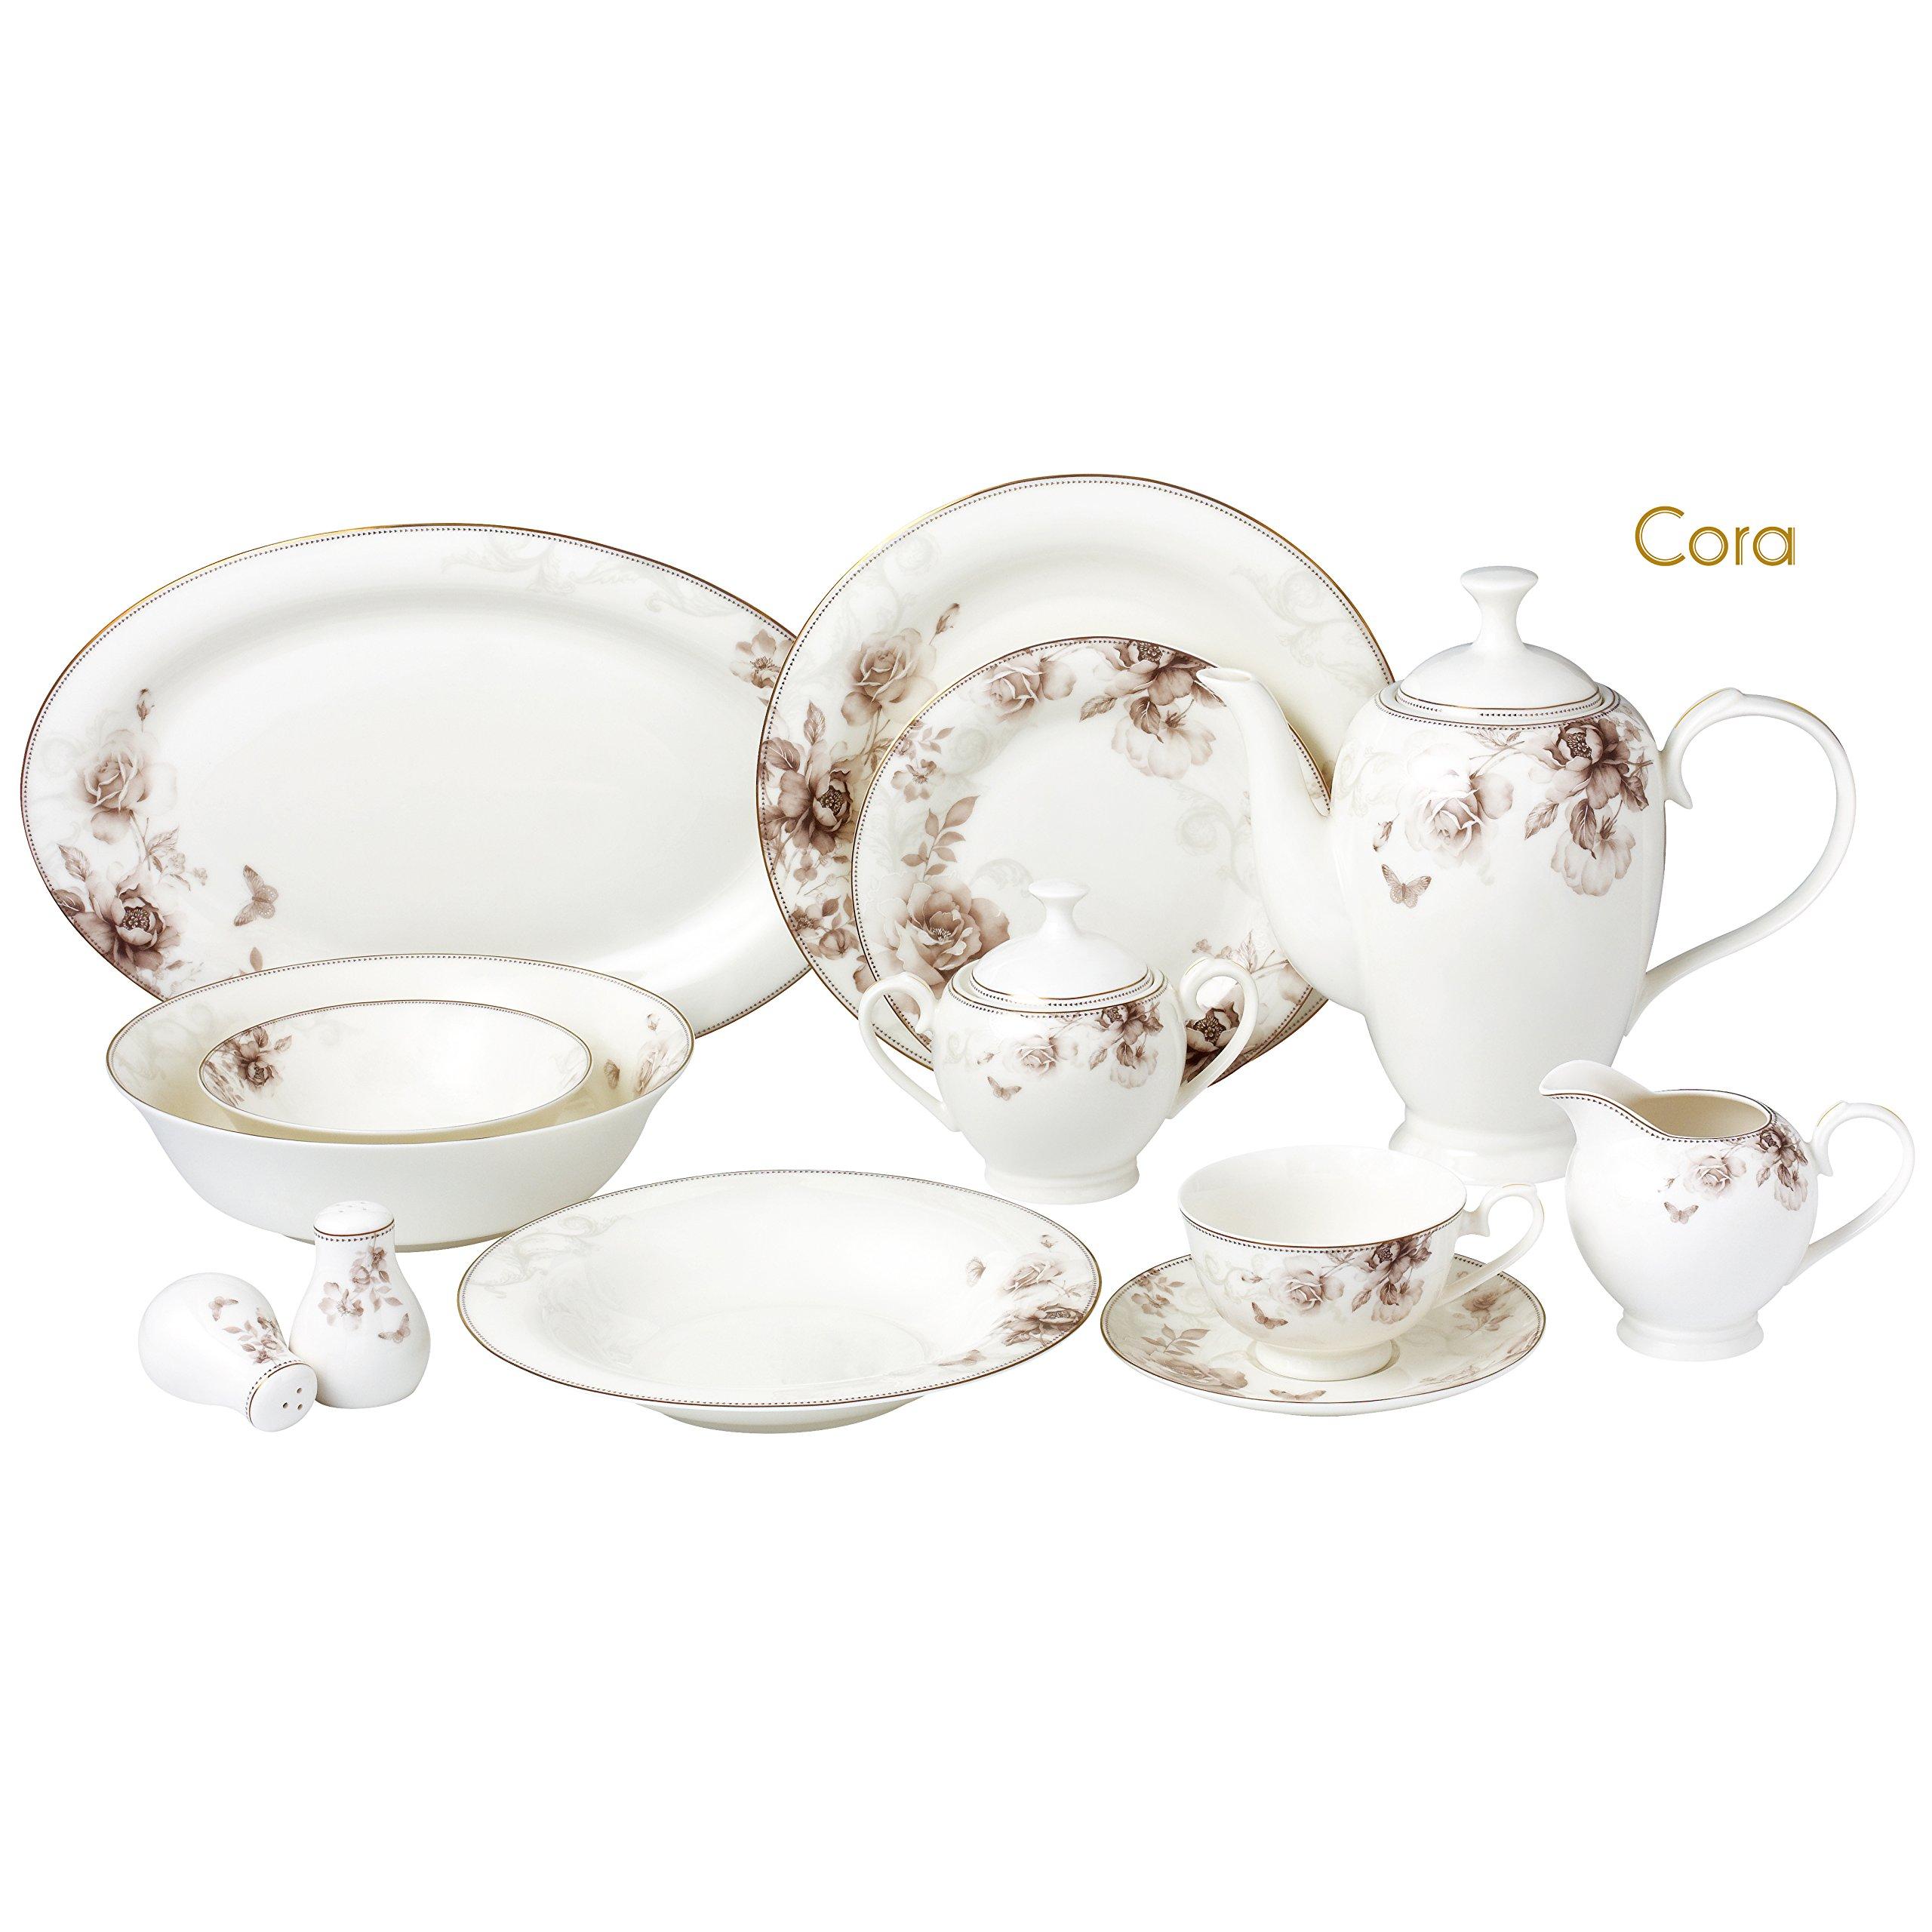 Lorren Home Trends Cora-57 57 Piece Dinnerware Set-Bone China Service for 8 People-Cora One Size Multicolor